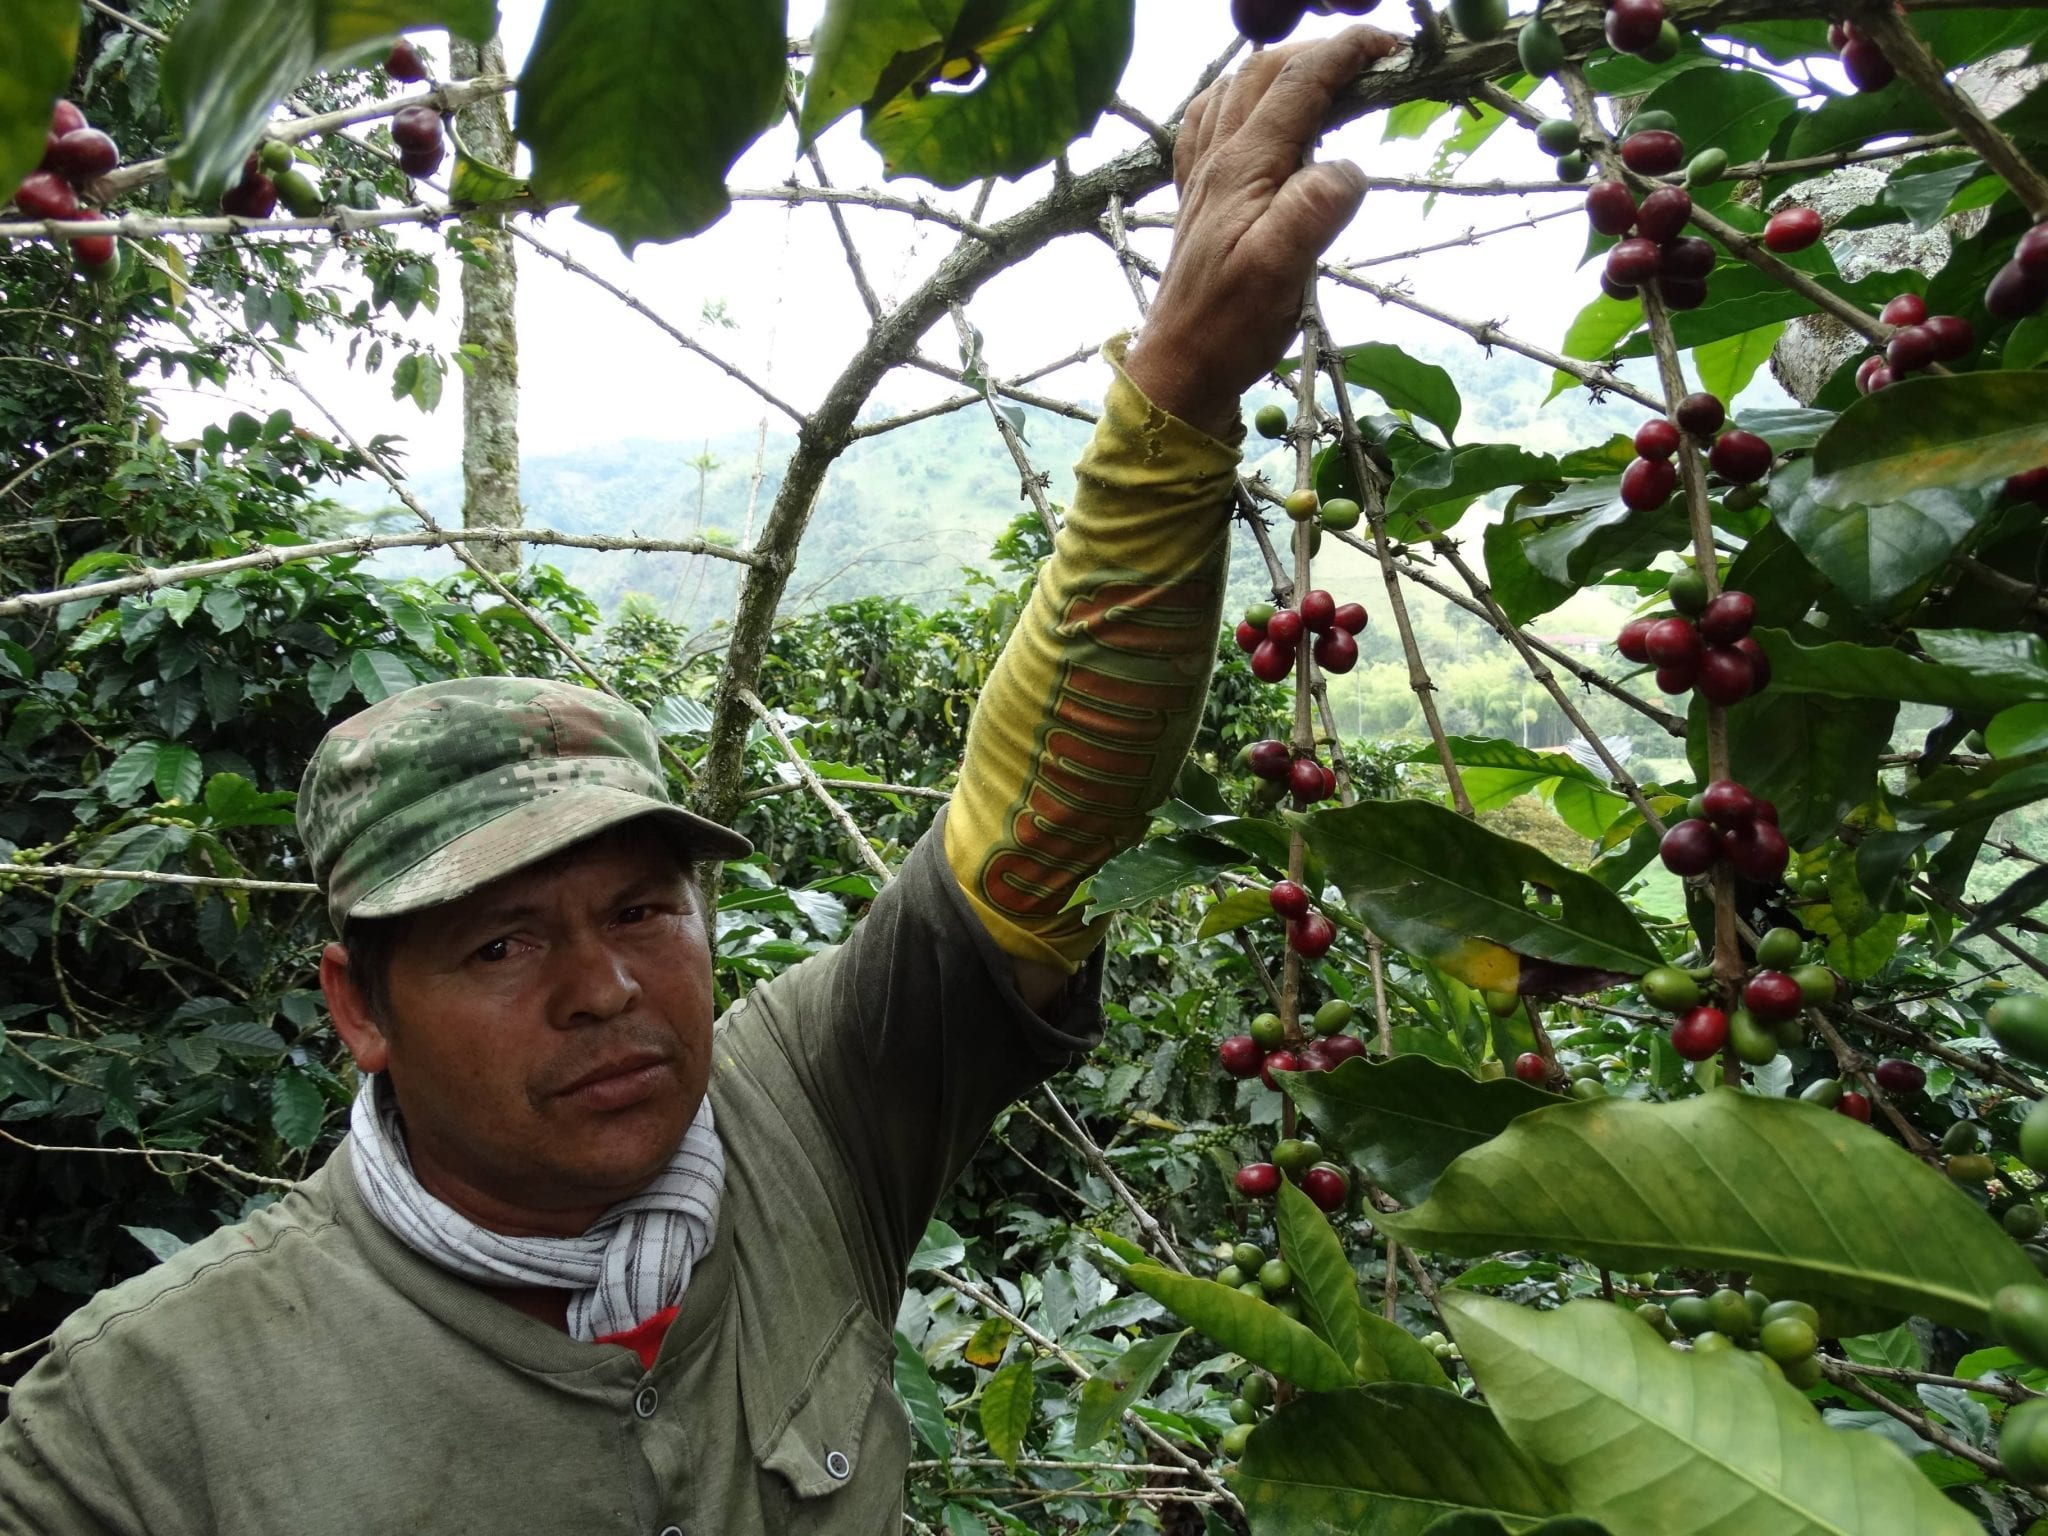 Coffee producer Jorge